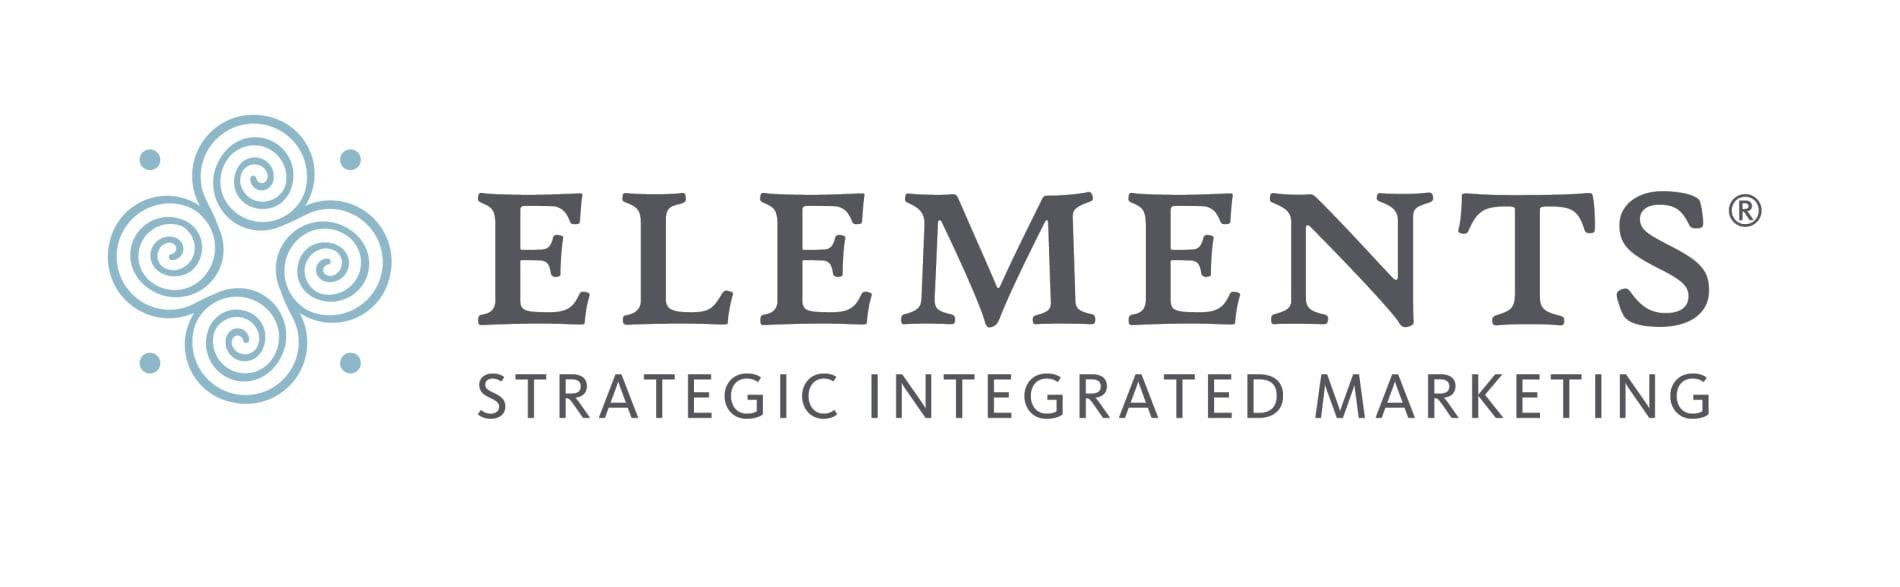 Elements-Design-09-2018-w1900.jpg